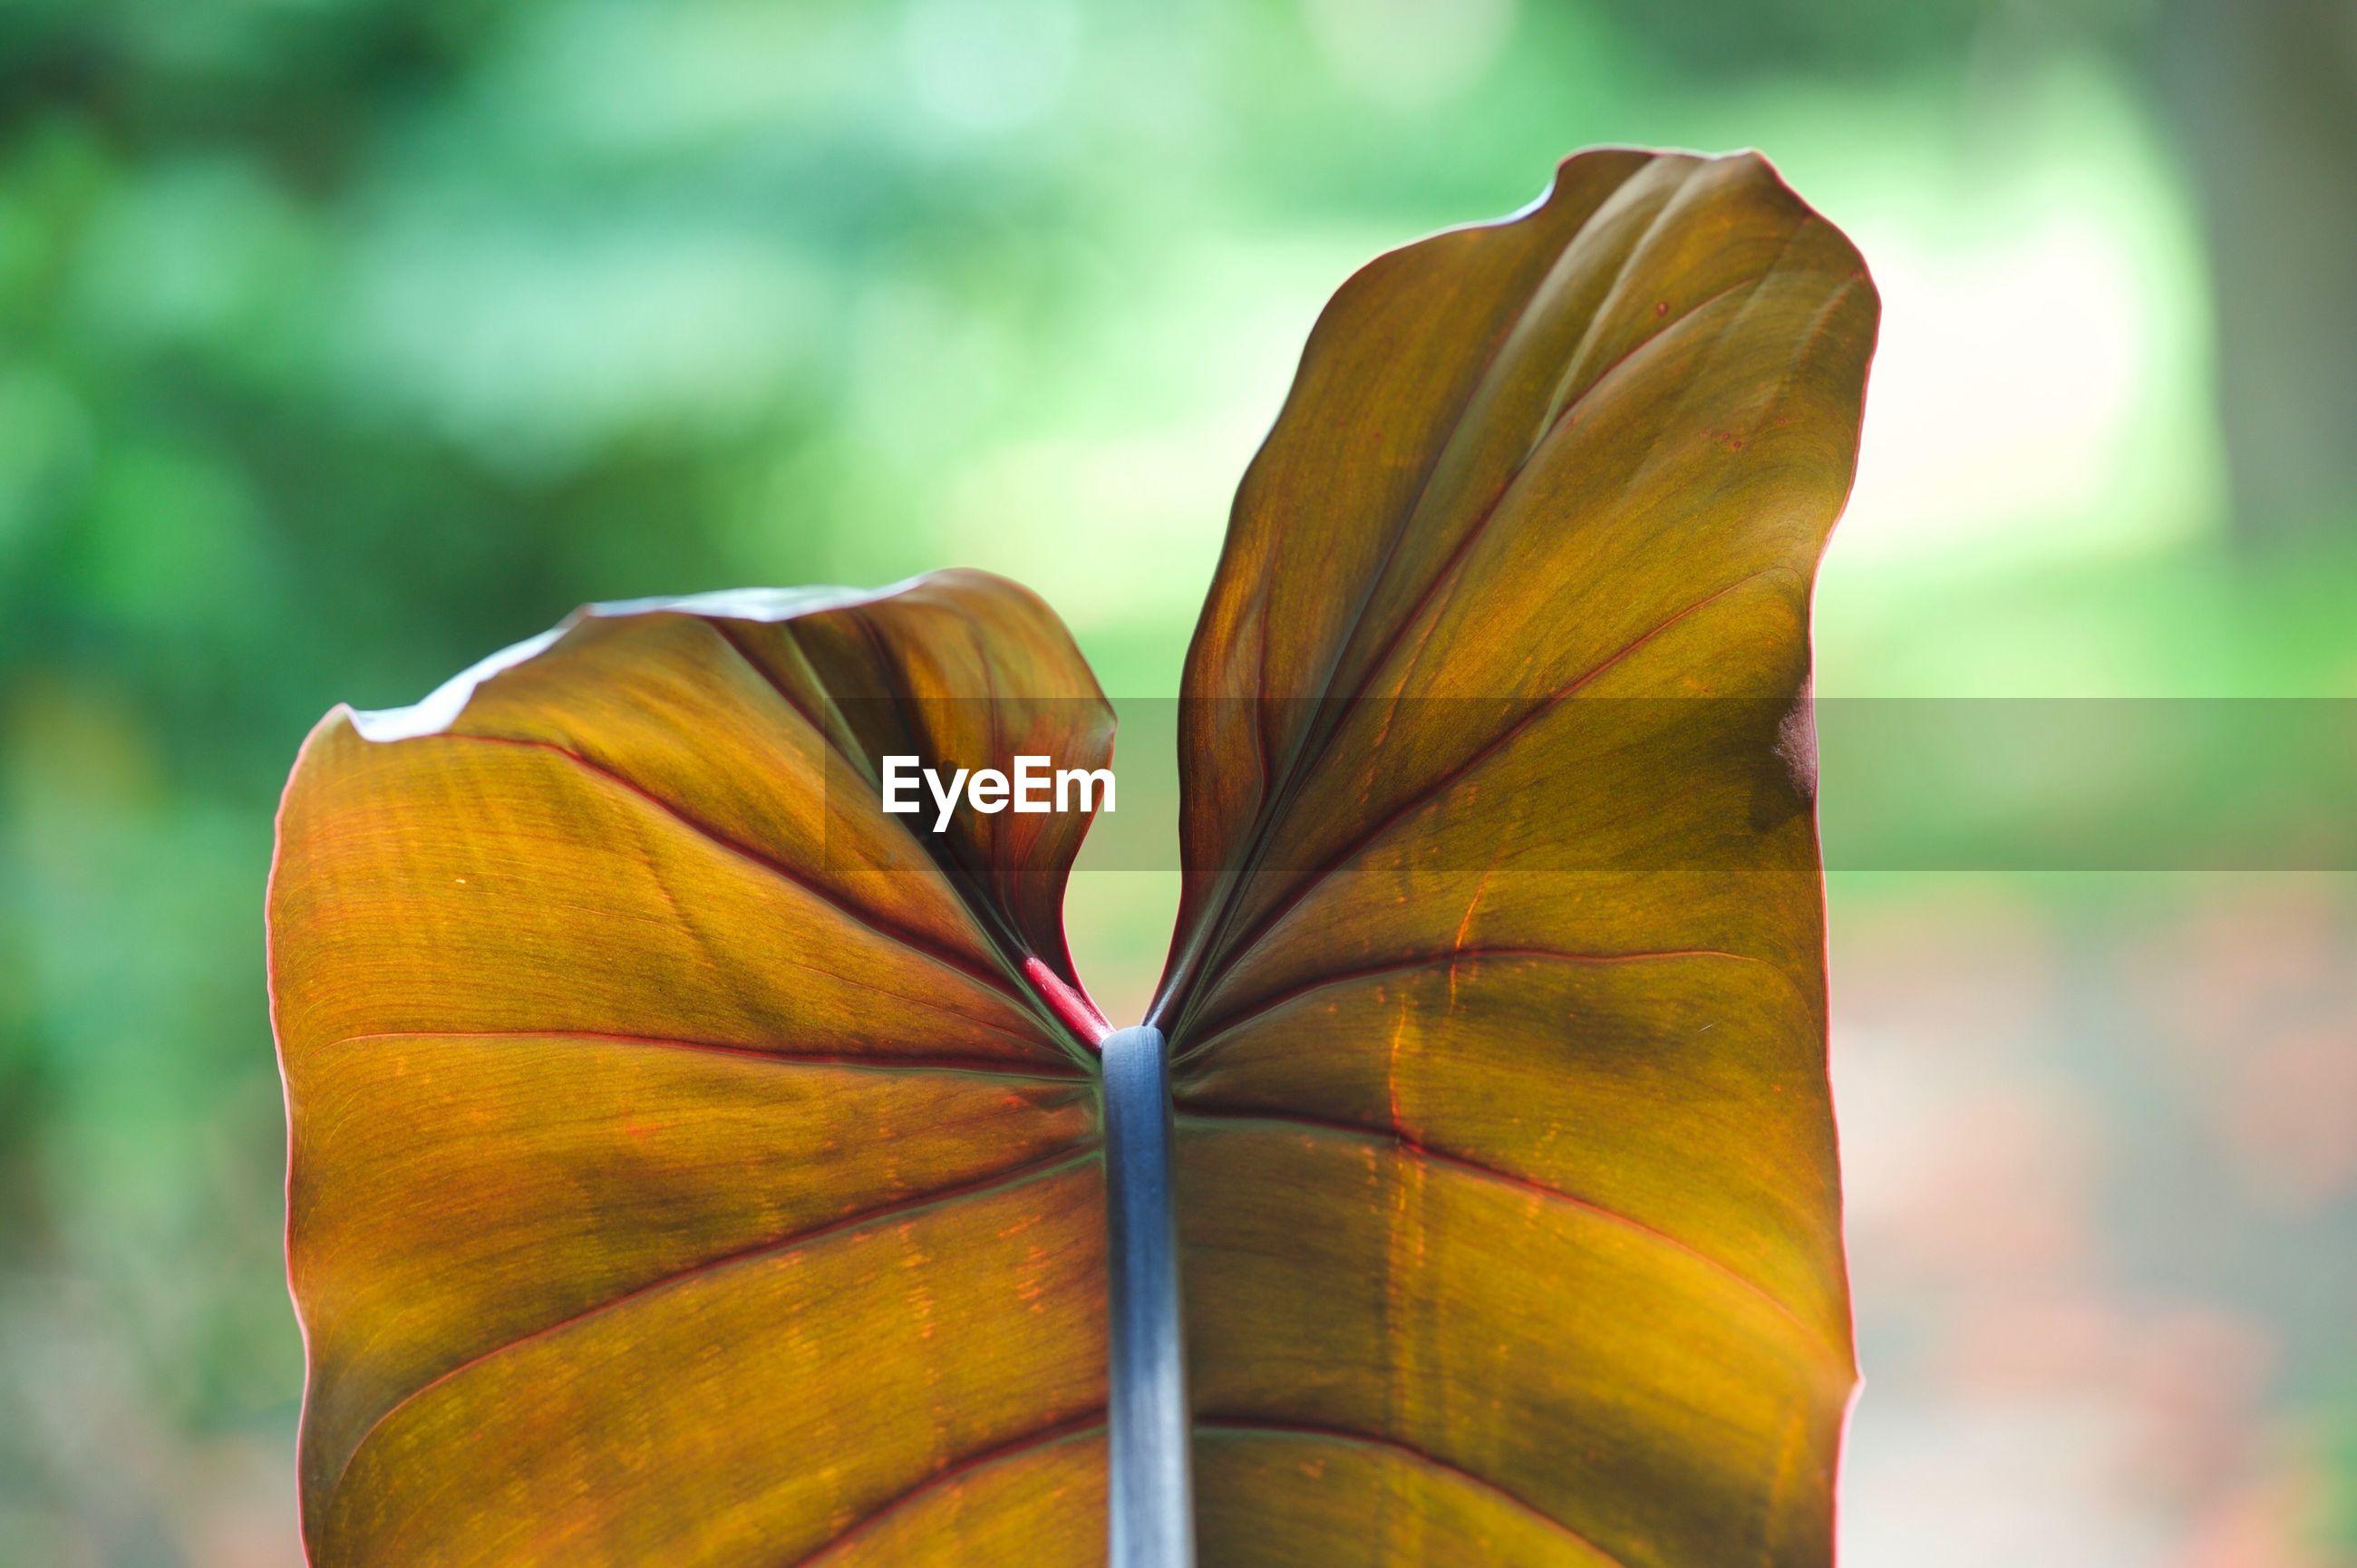 CLOSE-UP OF ORANGE LEAF ON PLANT OUTDOORS